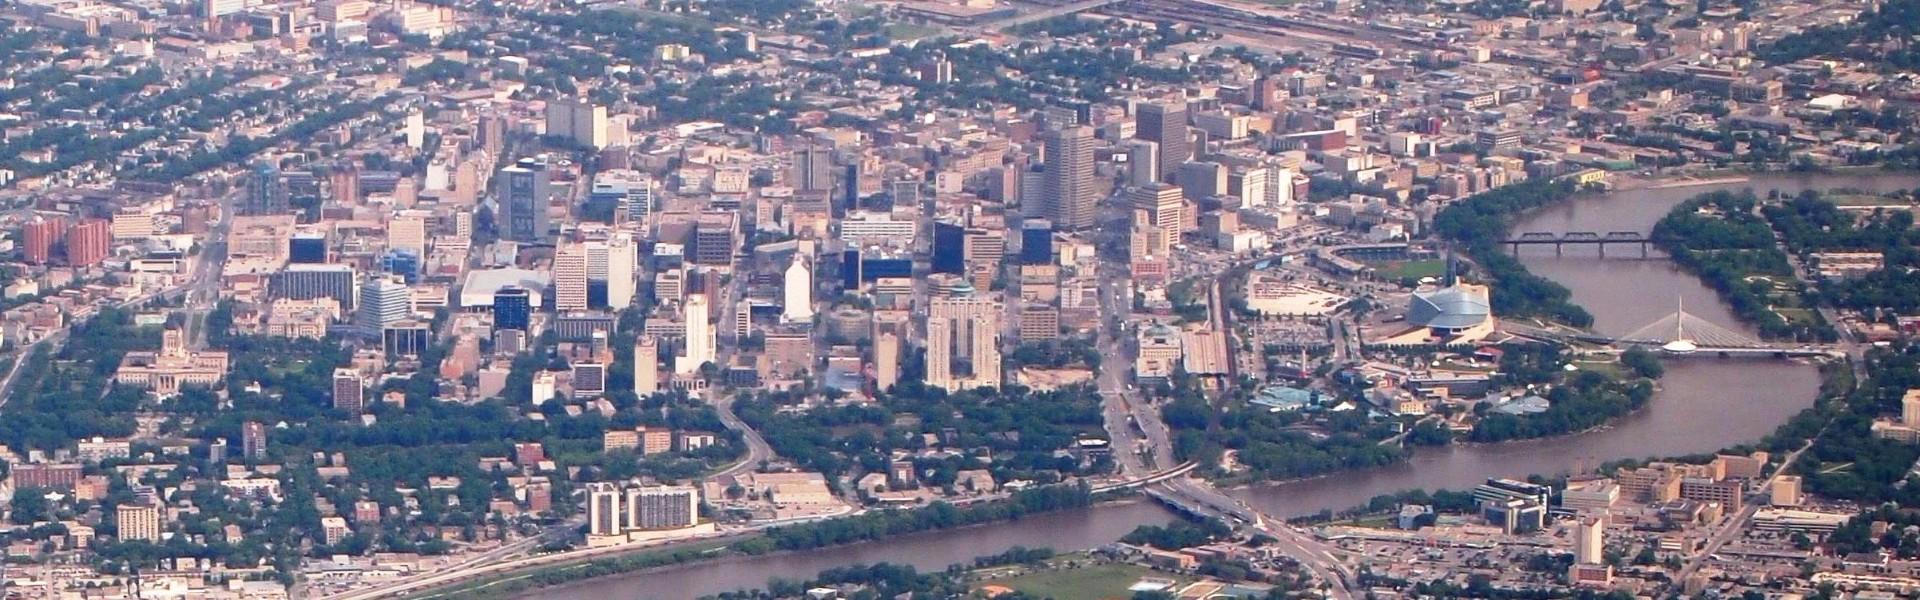 Winnipeg Population in 2017